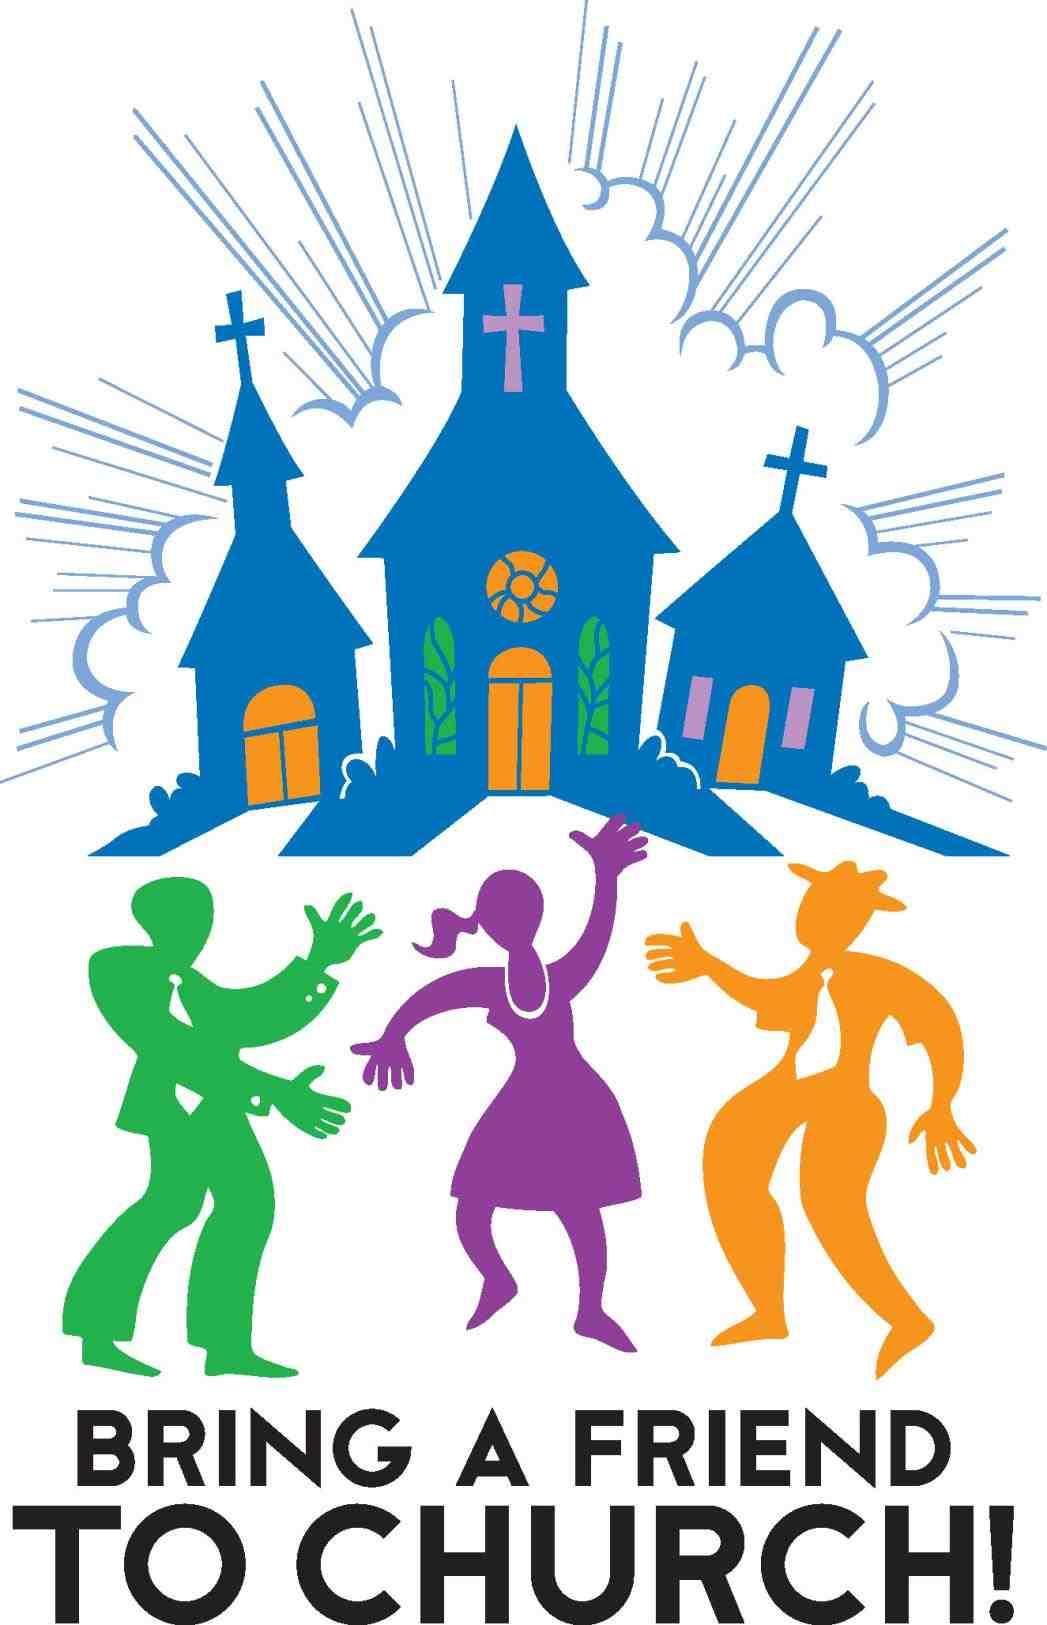 1047x1625 U Gcom Images And New Year Image Ix Images Religious Merry